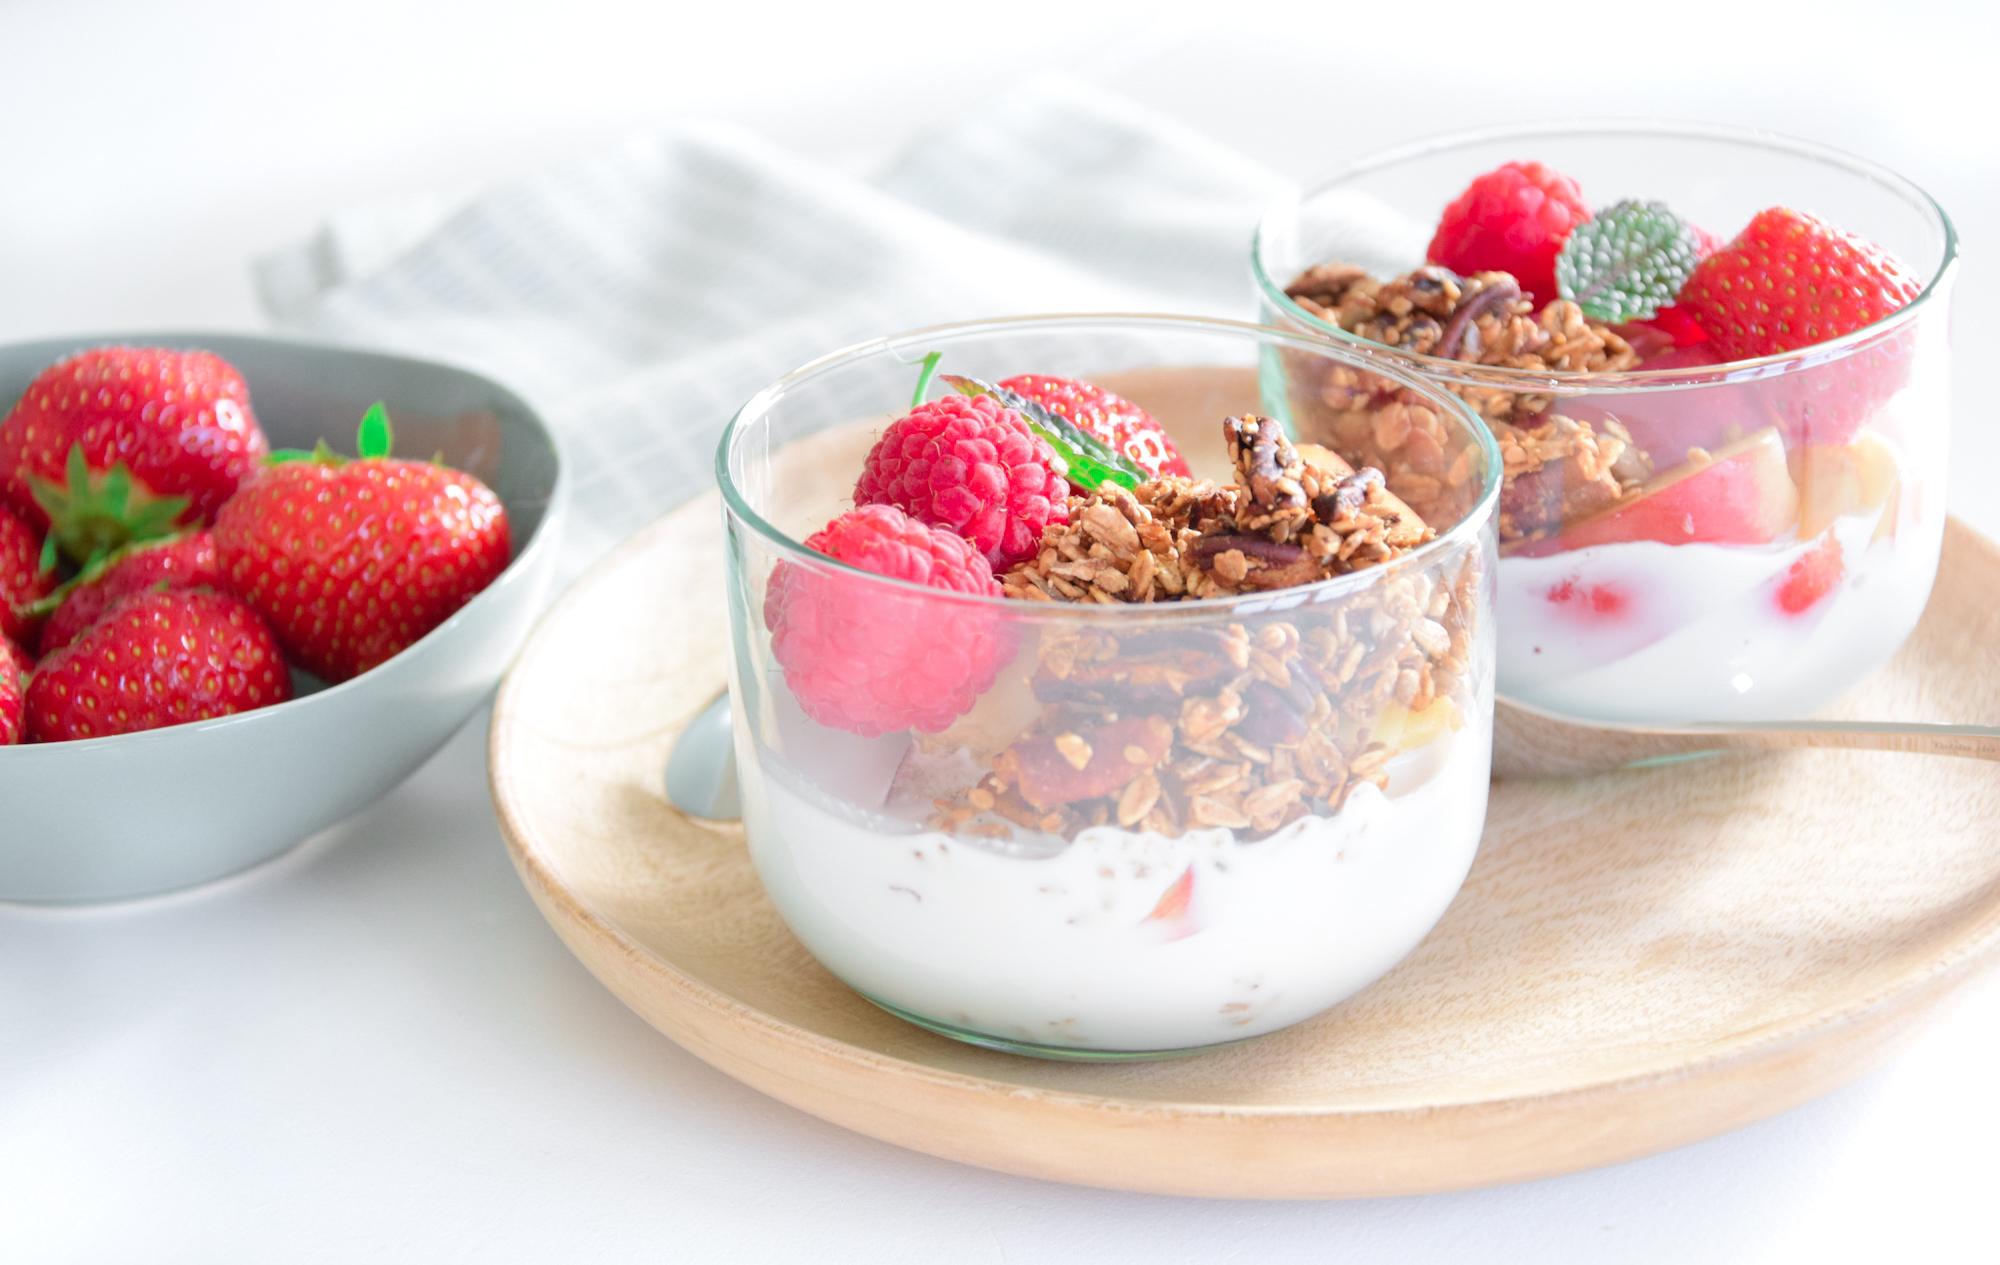 Summer fruit with XAVIES' Aardbei Quinoa granola and coconut milk